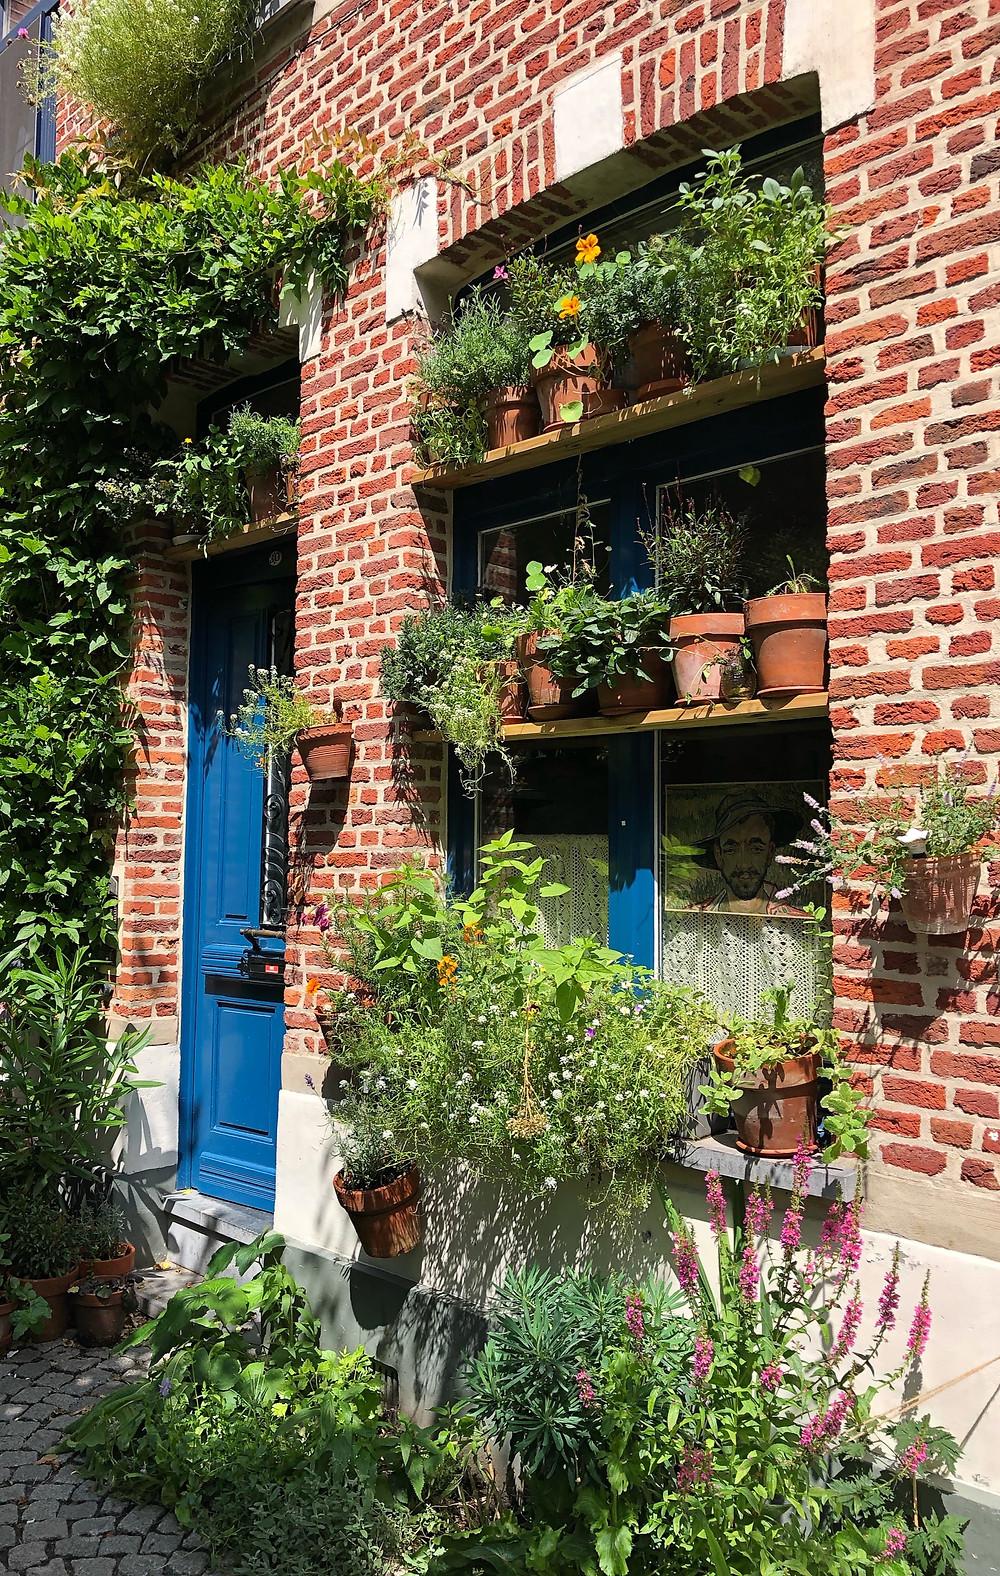 Plants in Beguinage Mechelen